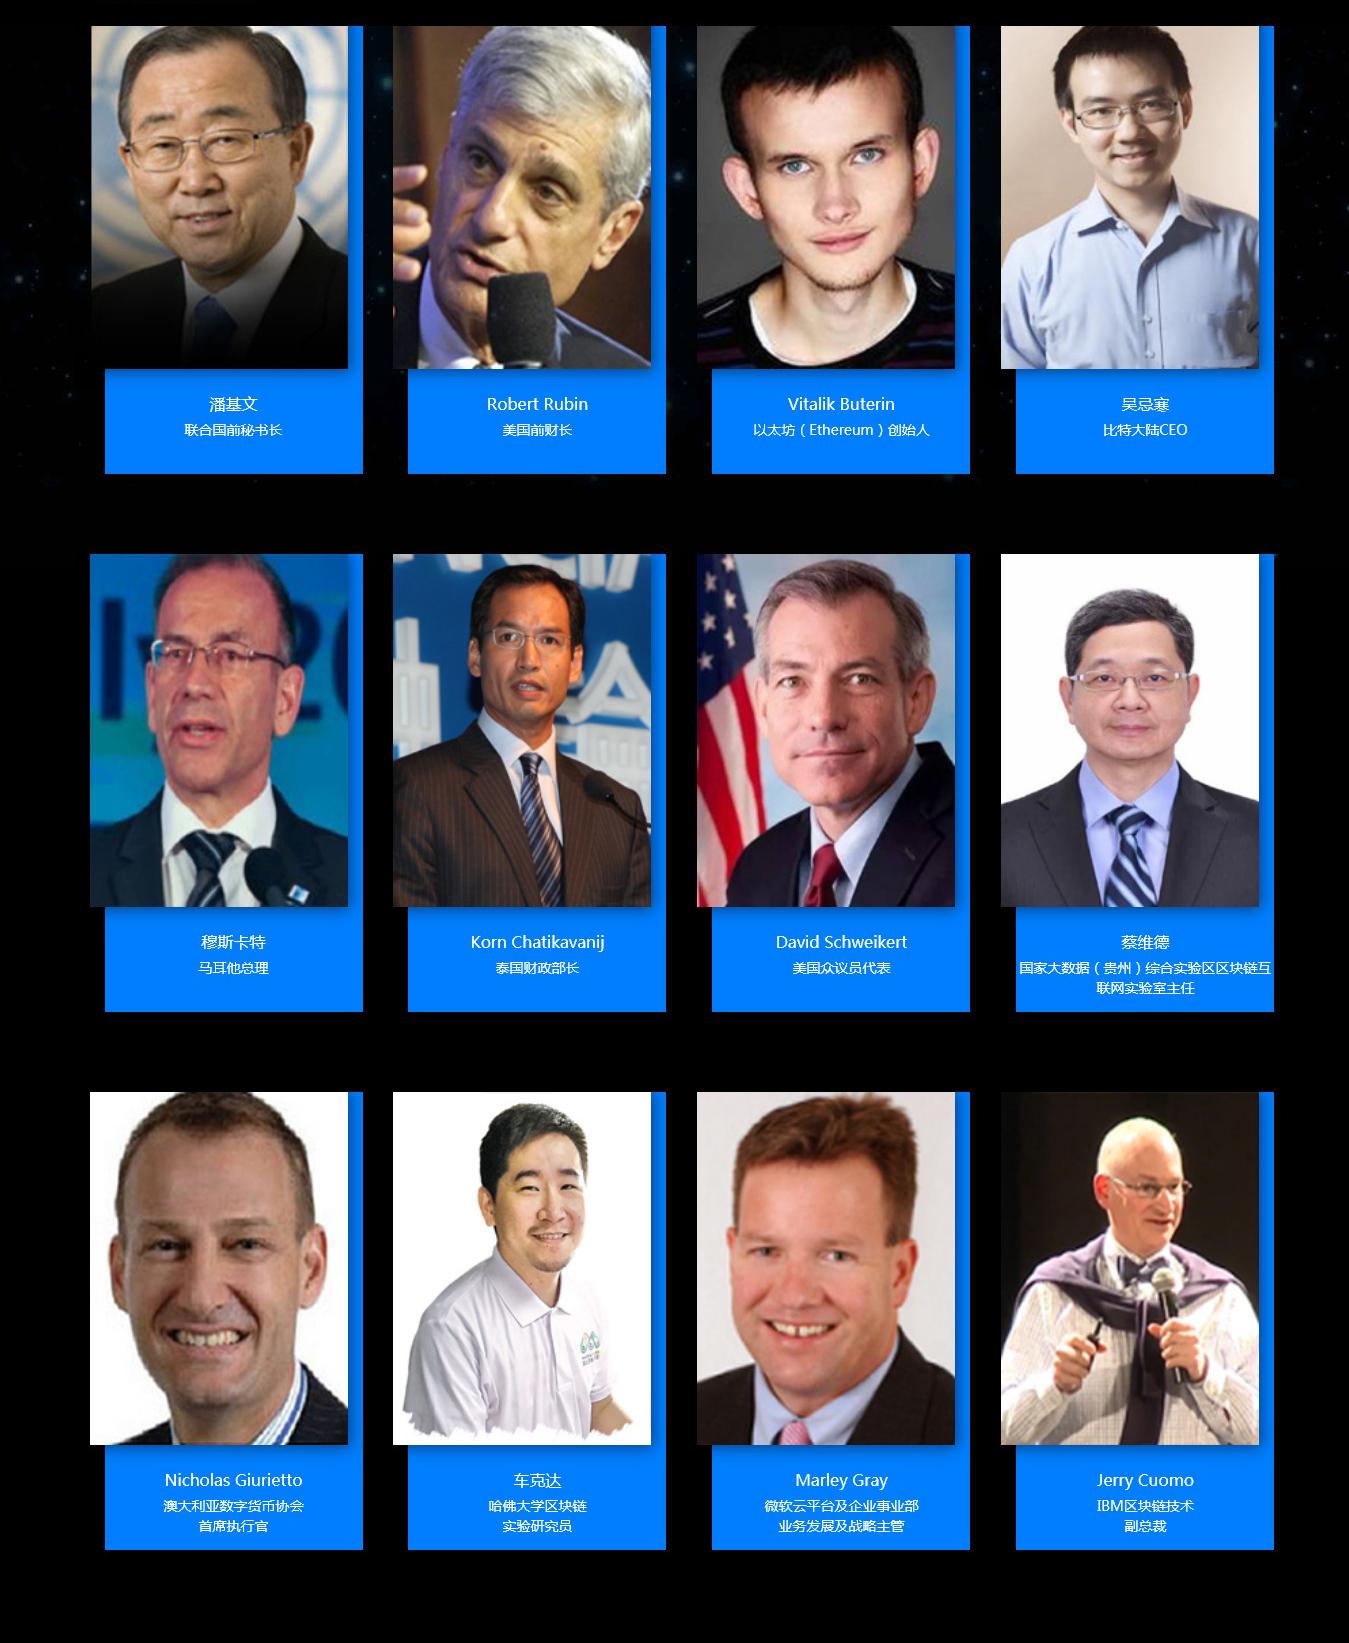 2018 GBCC全球区块链大会 Global Block-Chain Conference